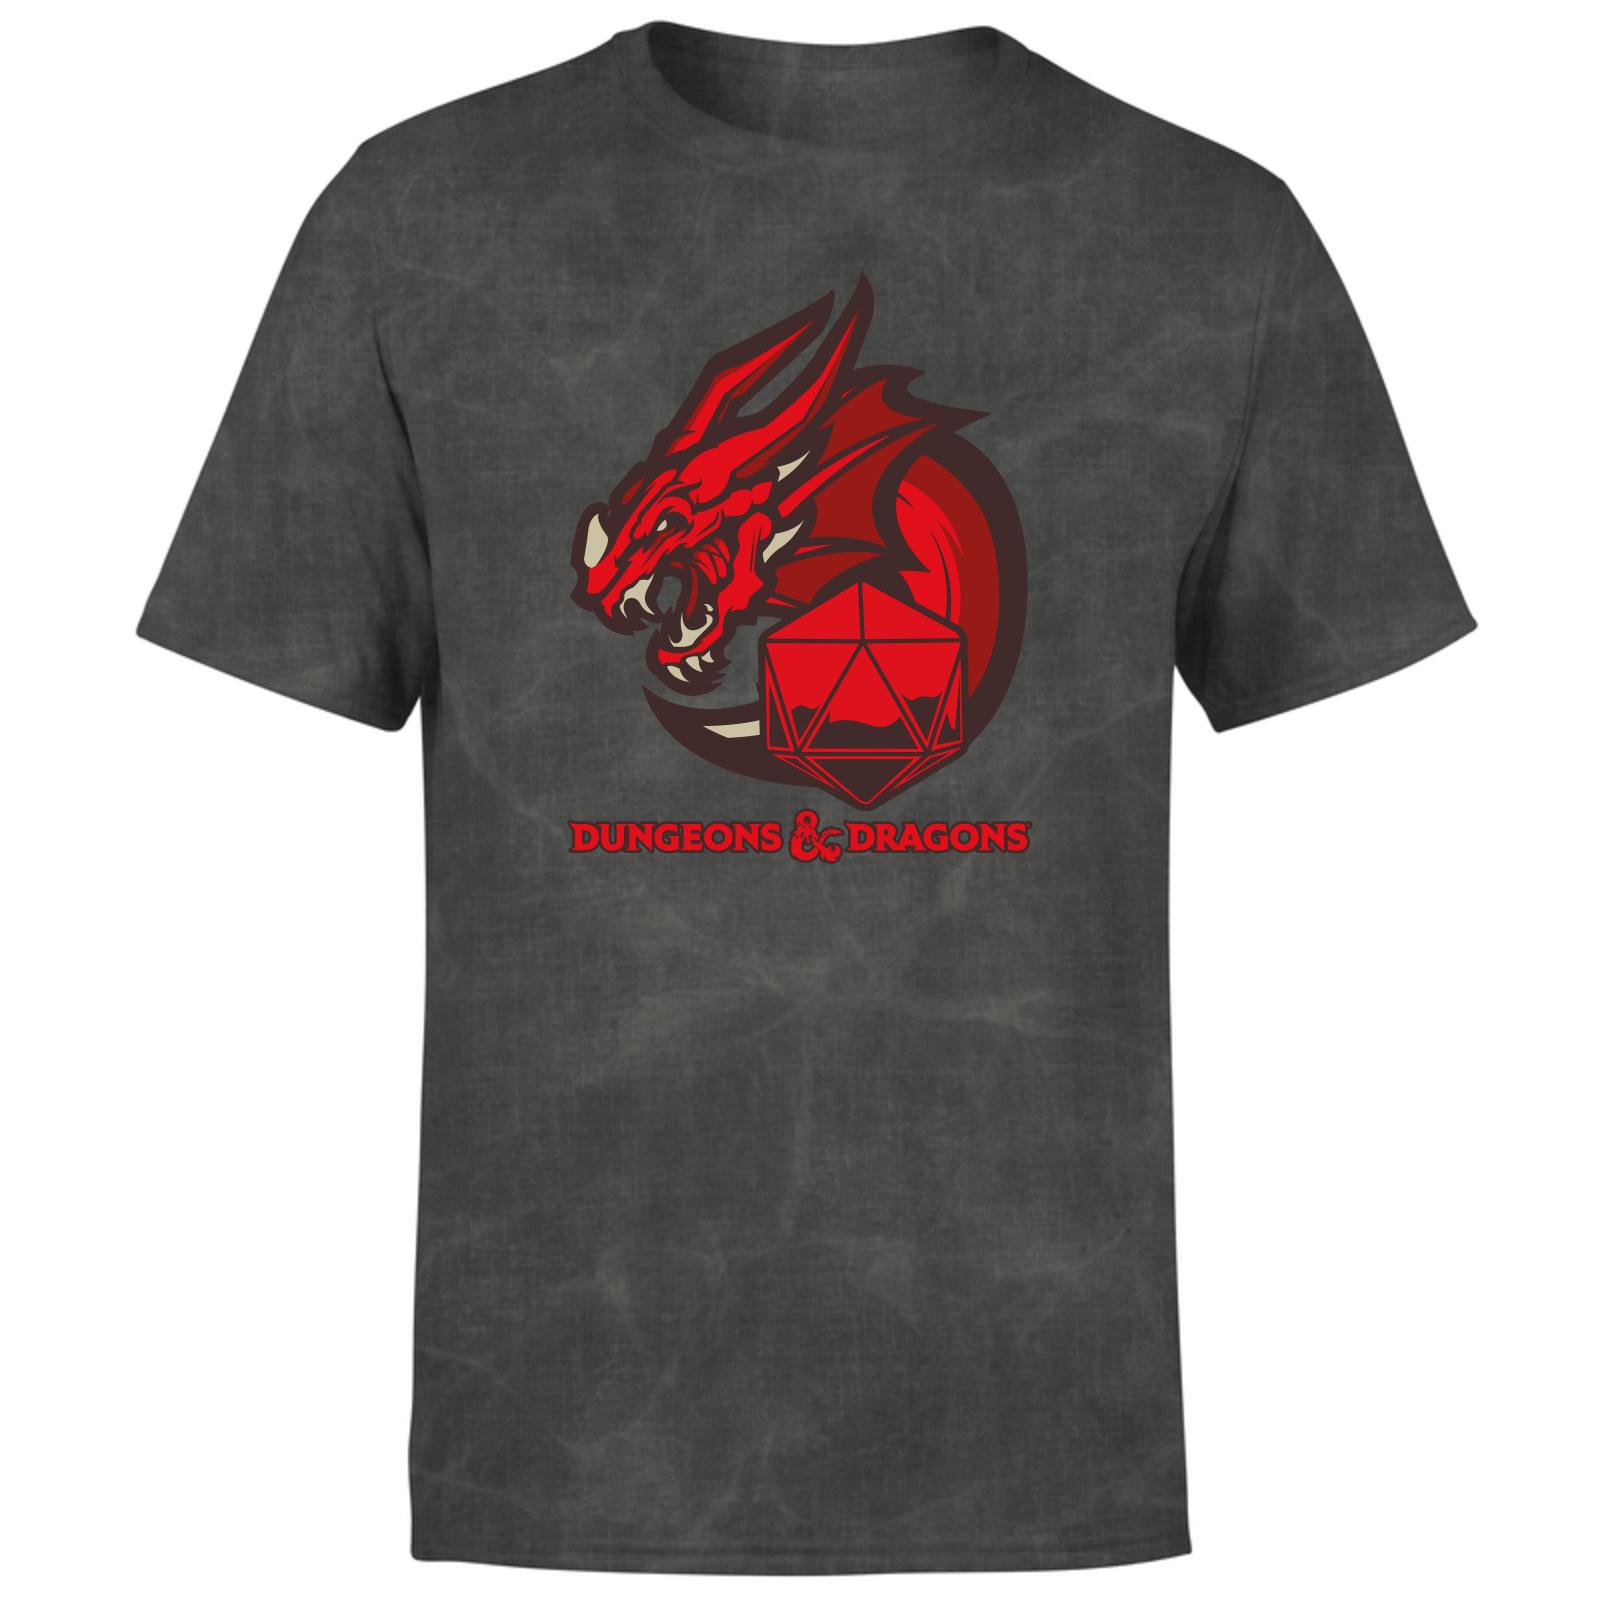 Dungeons & Dragons Esports D&D T-Shirt - Black Acid Wash - XS - Black Acid Wash